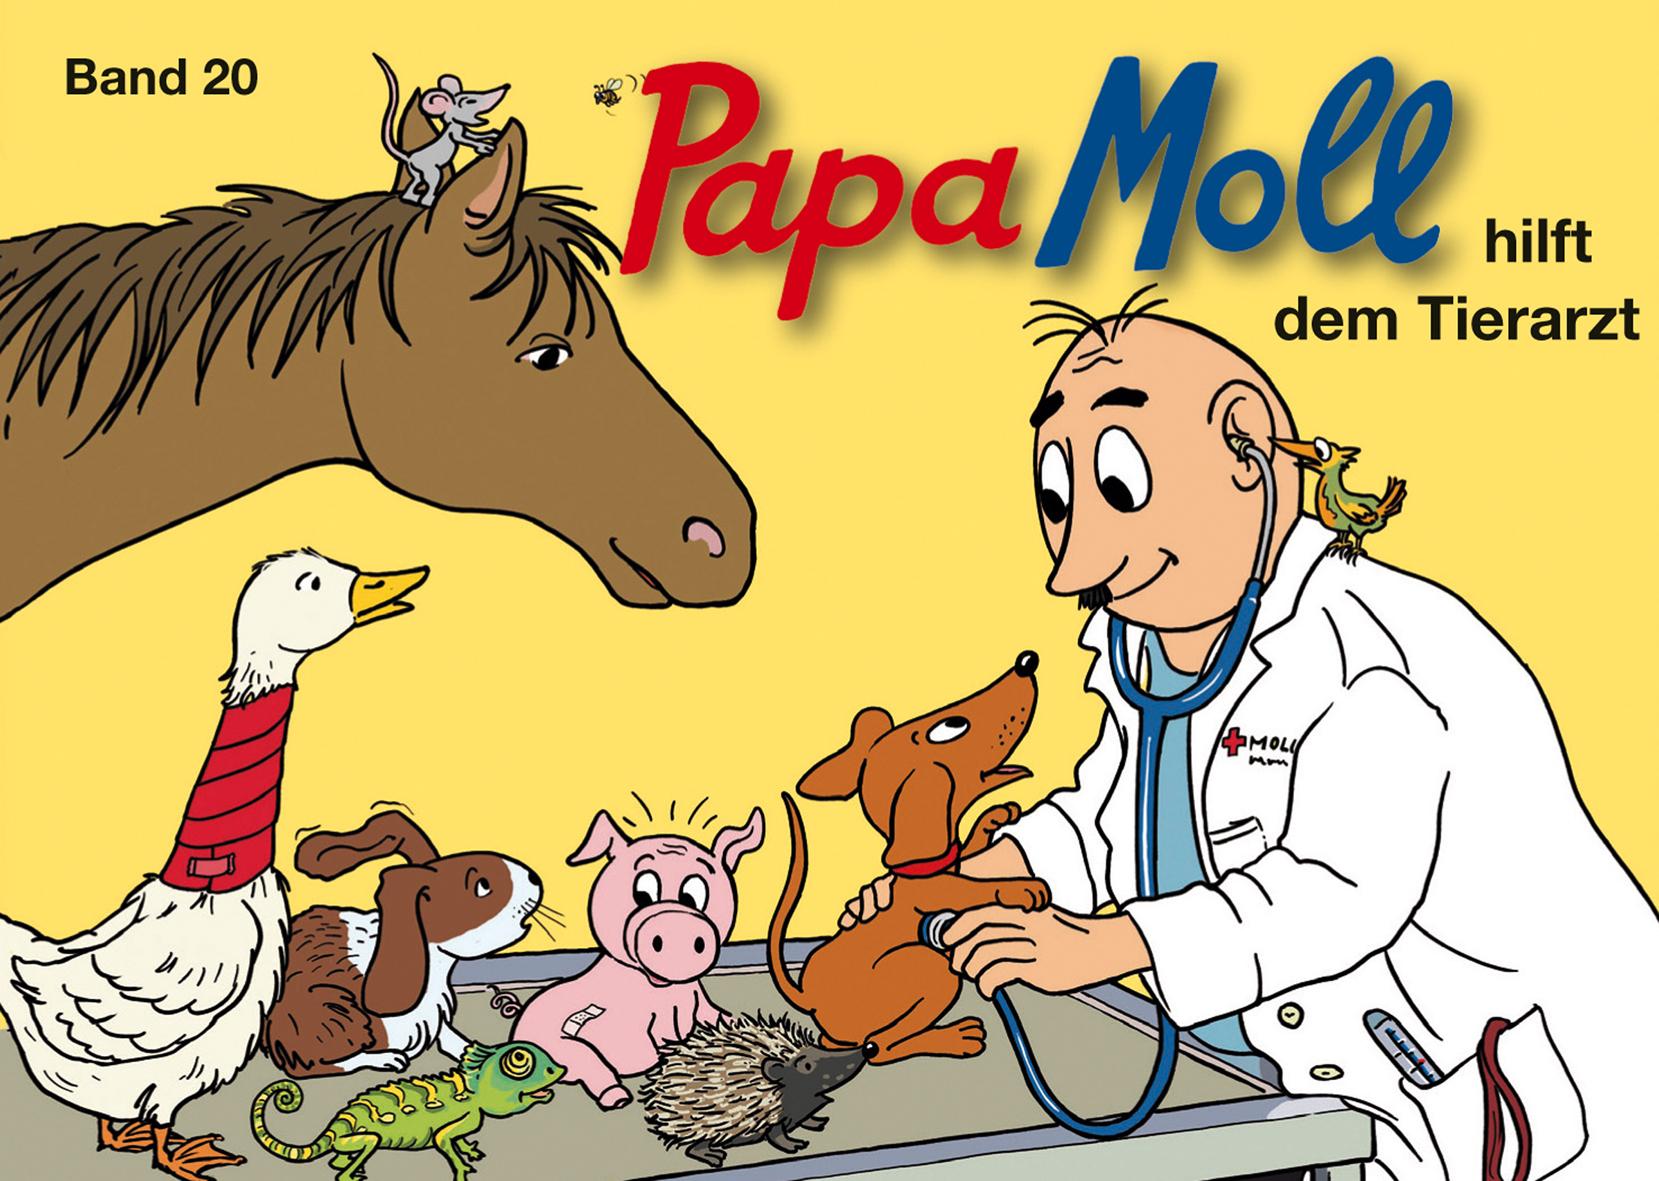 Papa Moll